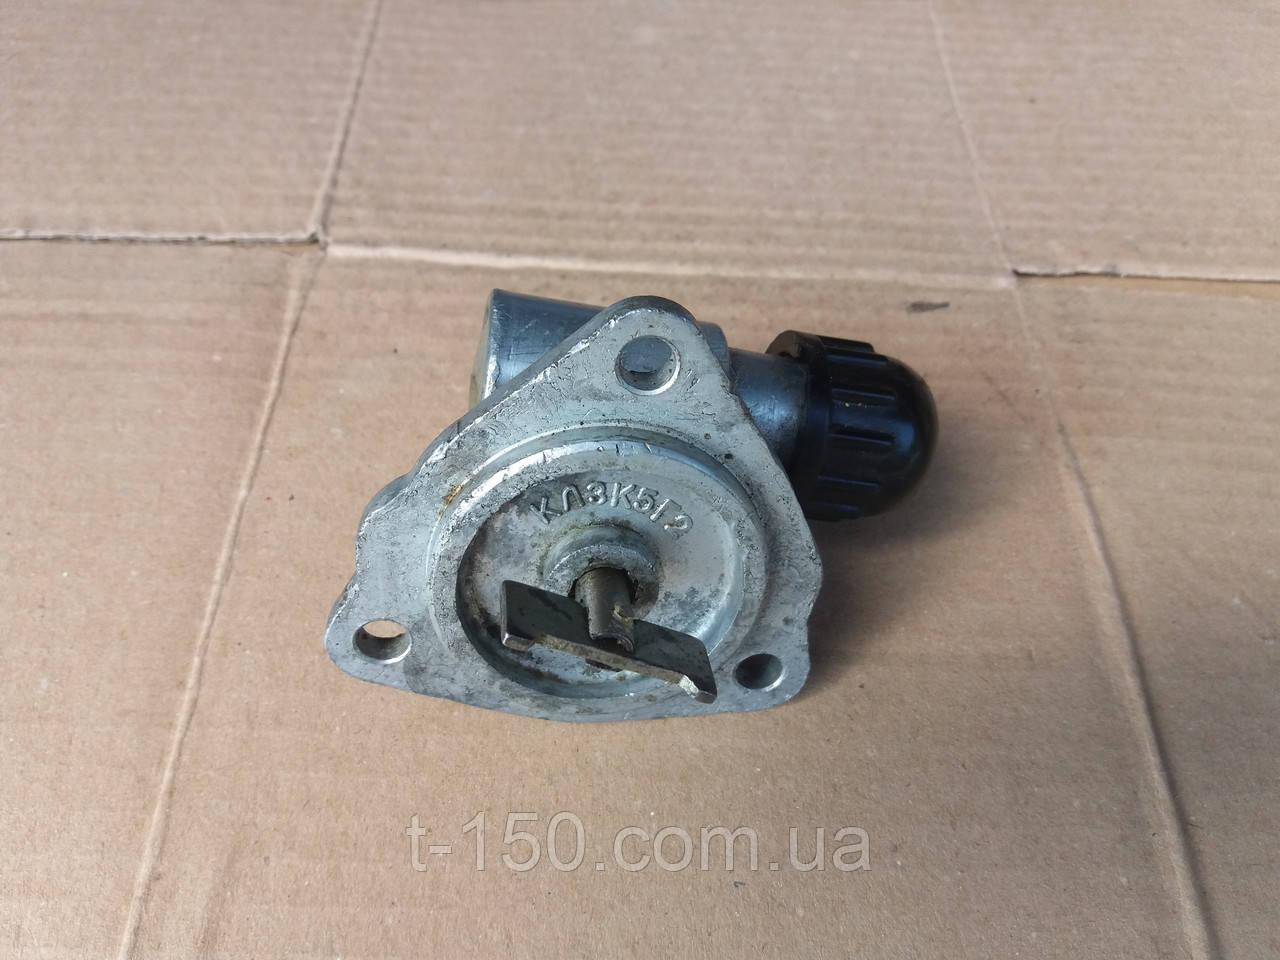 Привод тахоспидометра Т-150 (ПТ-3802010)